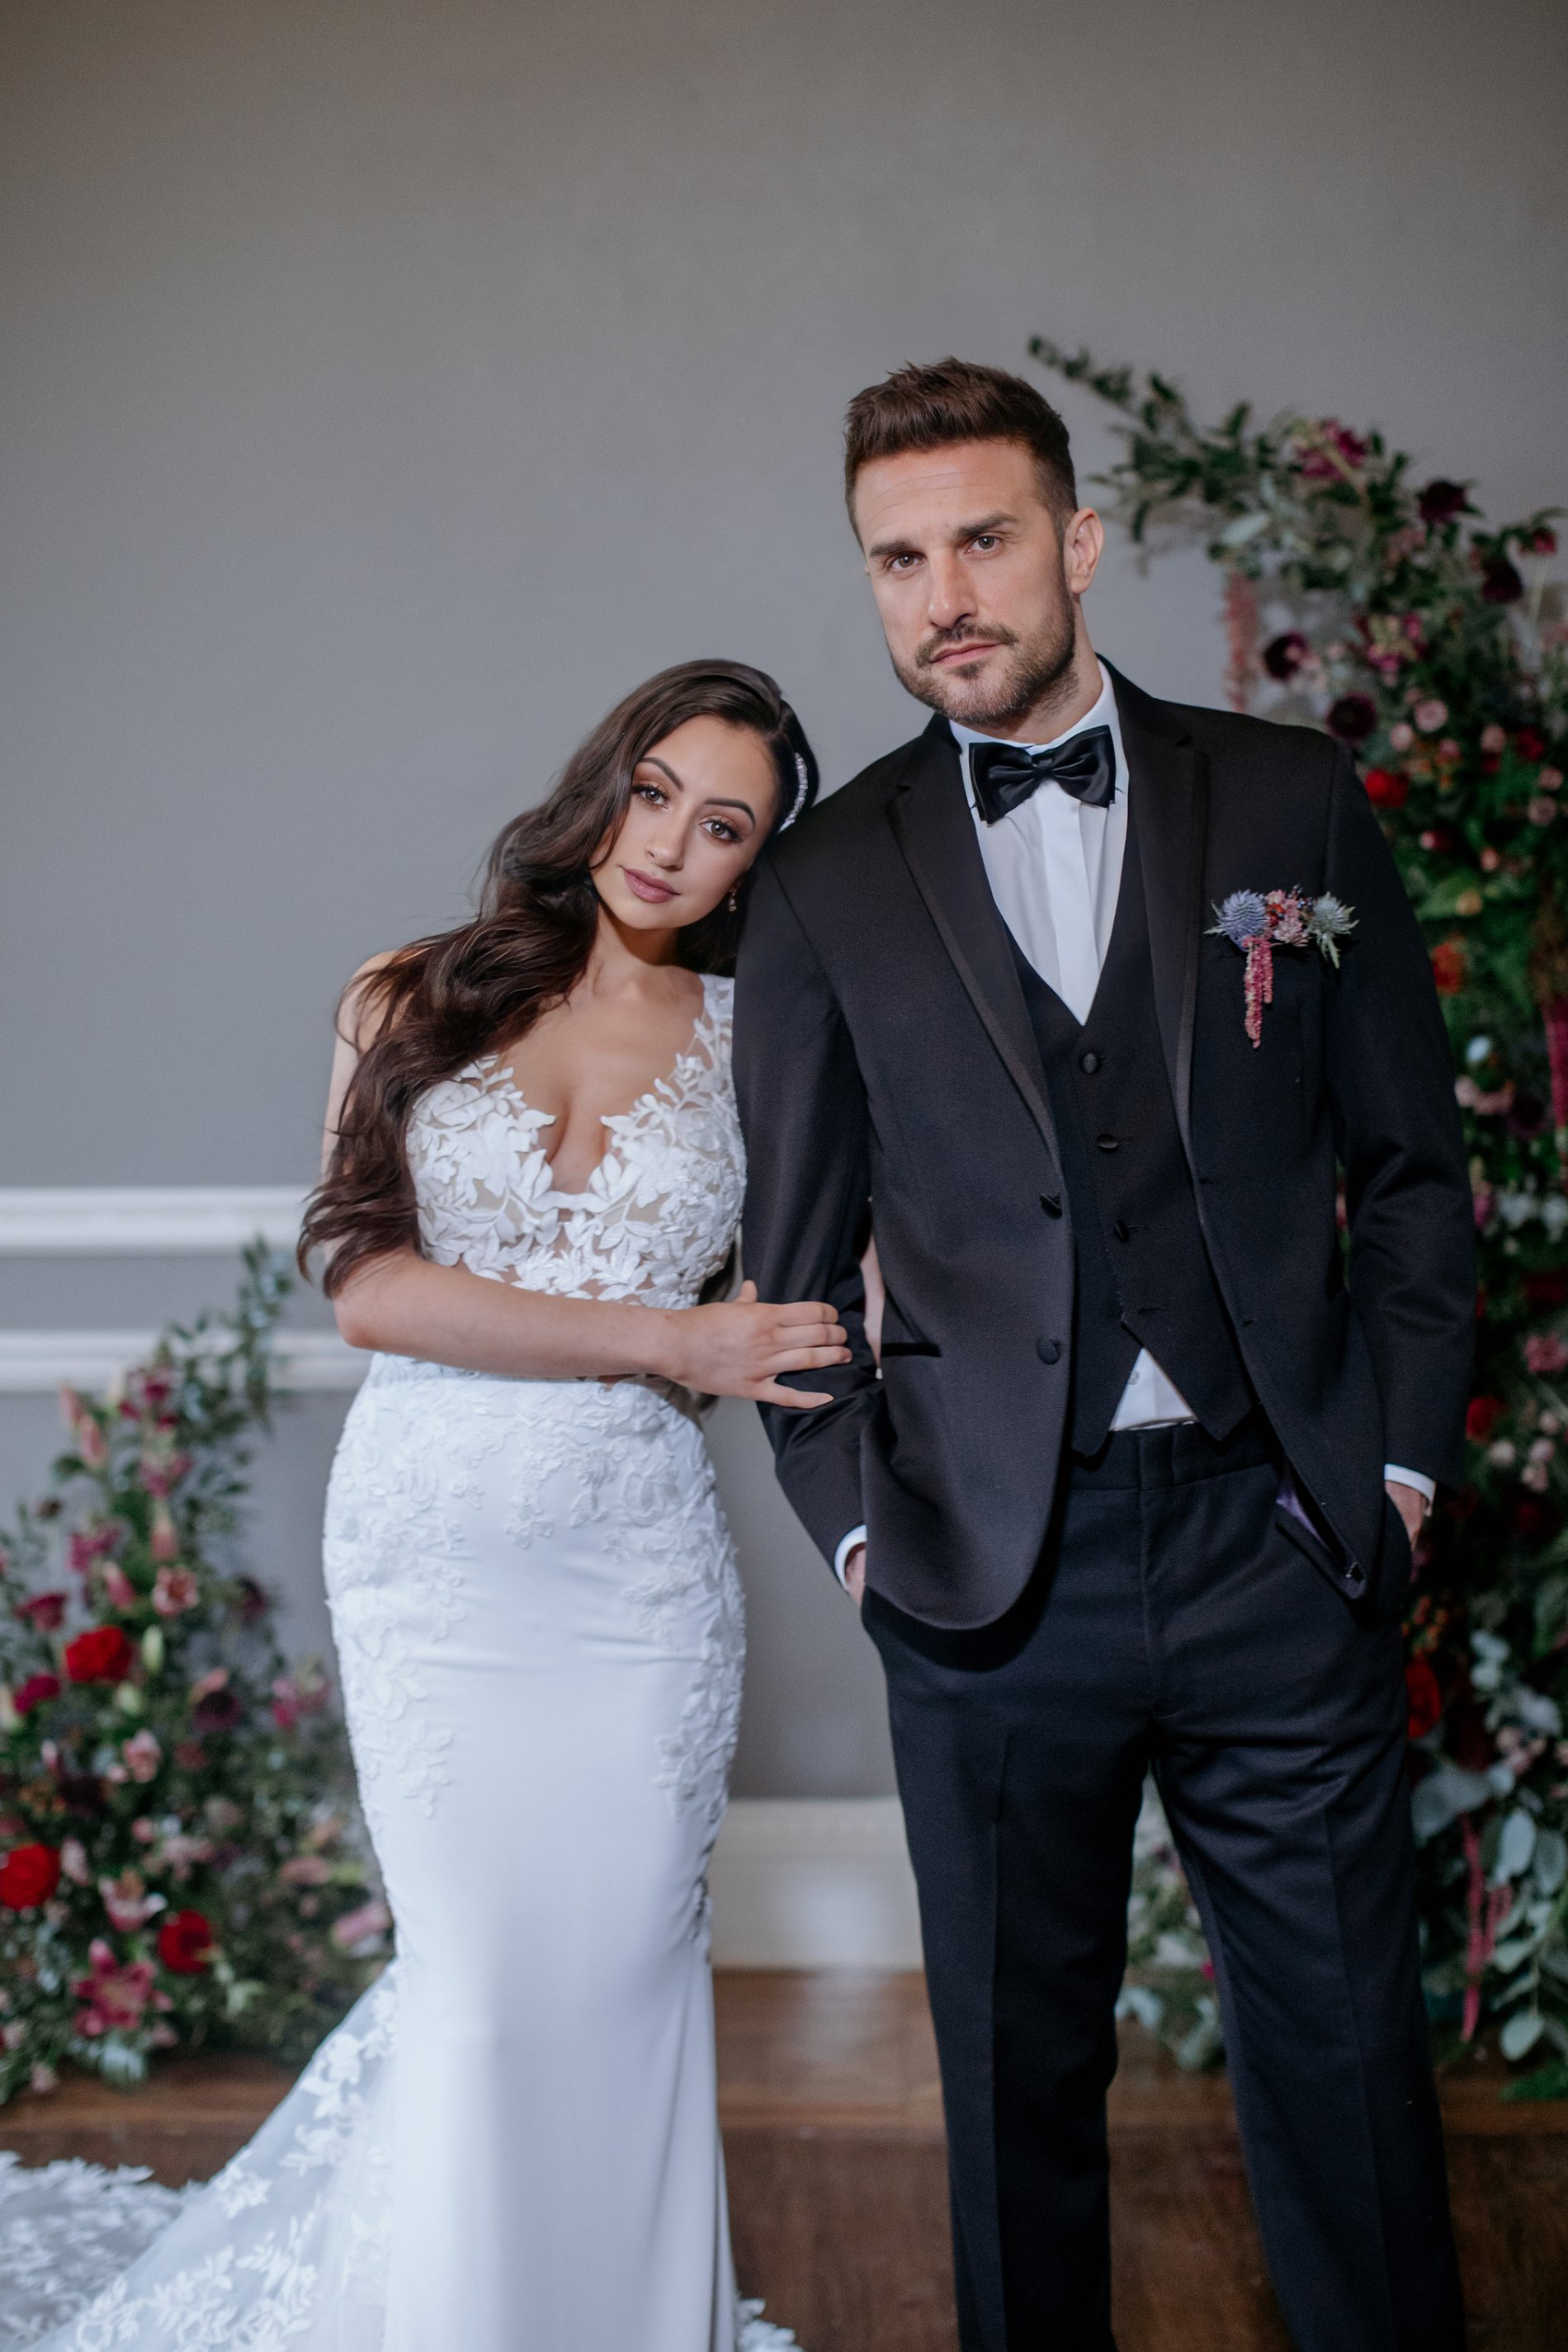 A Black Tie Wedding Creative Shoot at Saltmarshe Hall (c) Natalie Hamilton Photography (39)